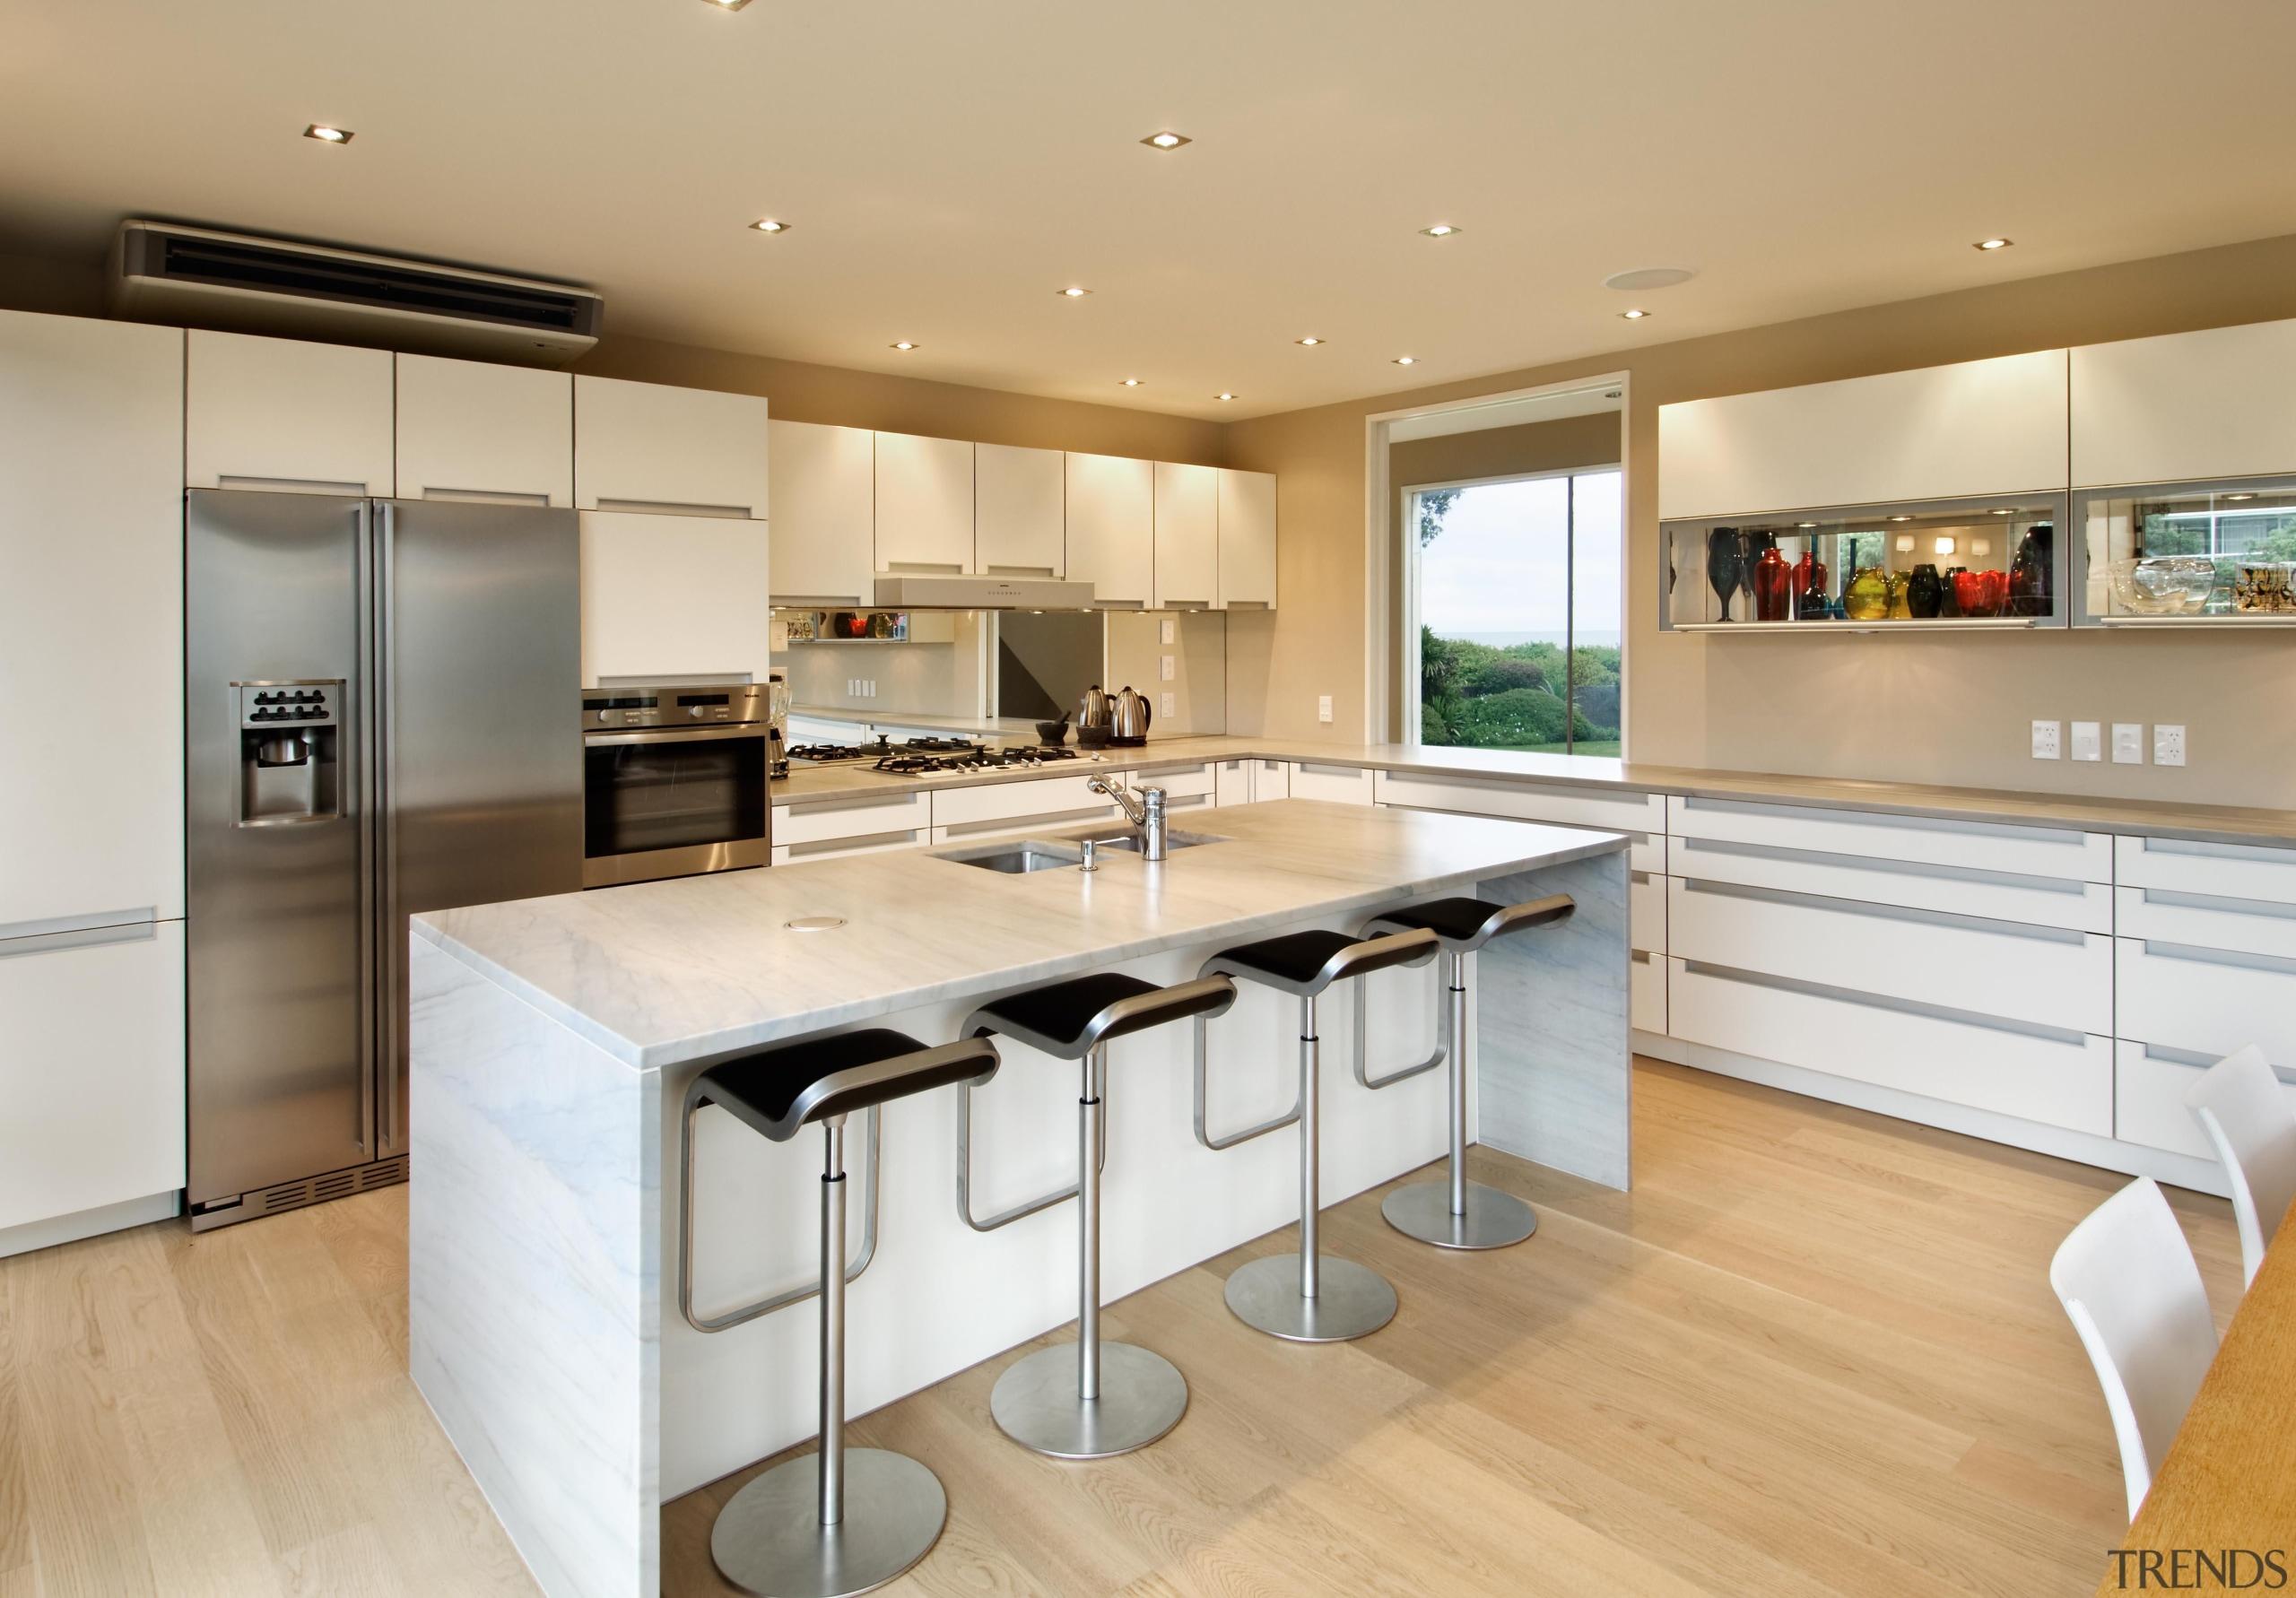 Paraparaumu Kitchen - Paraparaumu Kitchen - cabinetry | cabinetry, countertop, cuisine classique, interior design, kitchen, real estate, orange, gray